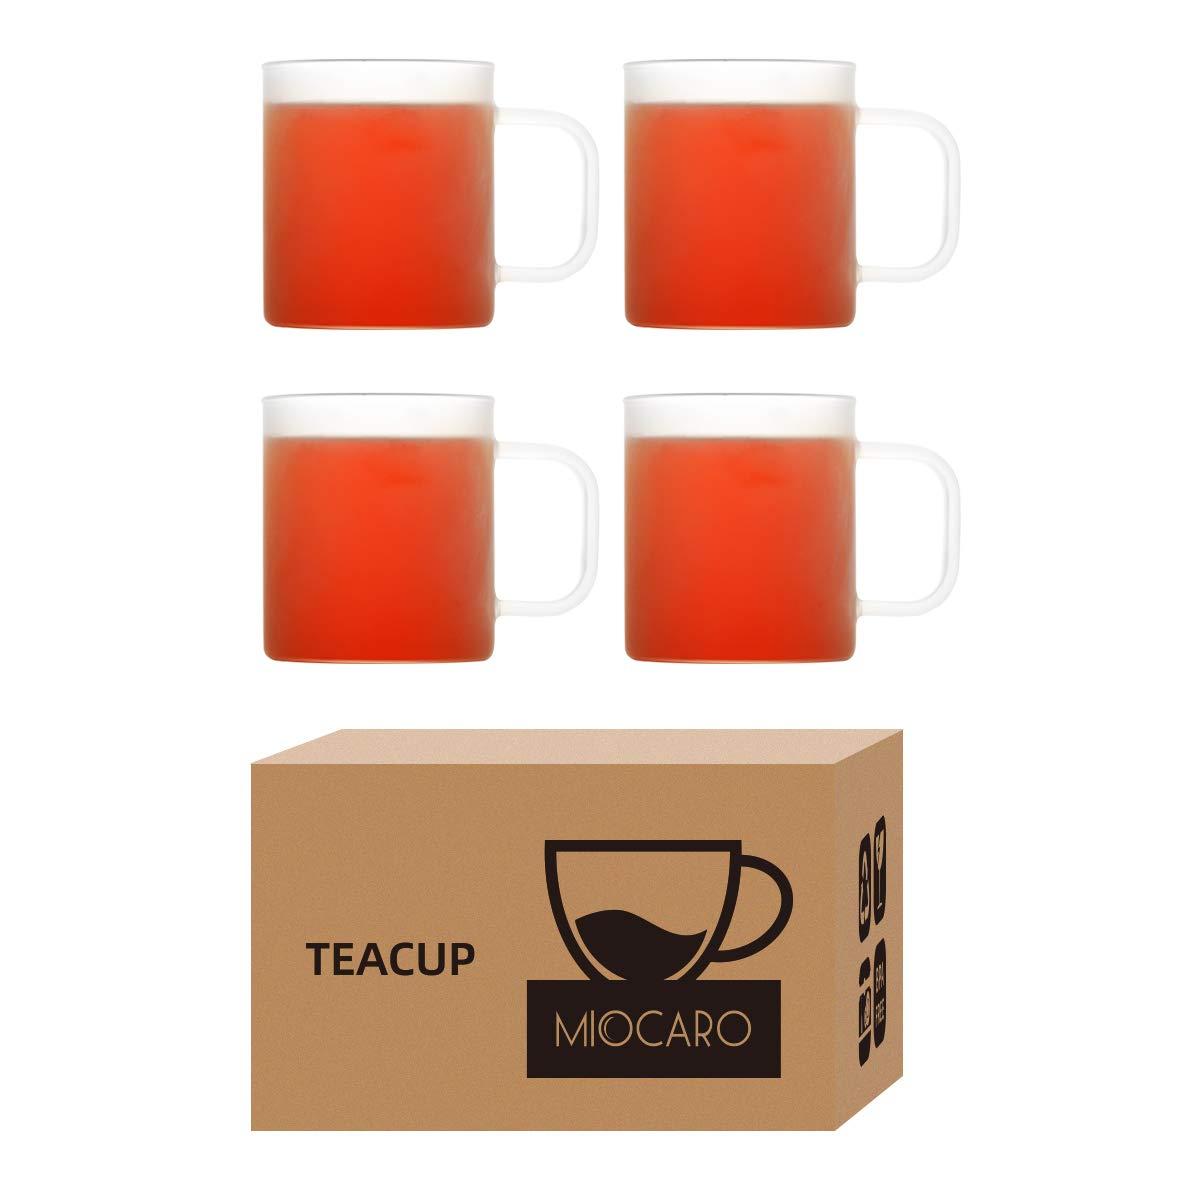 MIOCARO Glass Espresso Mug Coffee Cup Matt Tea Cup With Handle - 12 oz, Set of 4